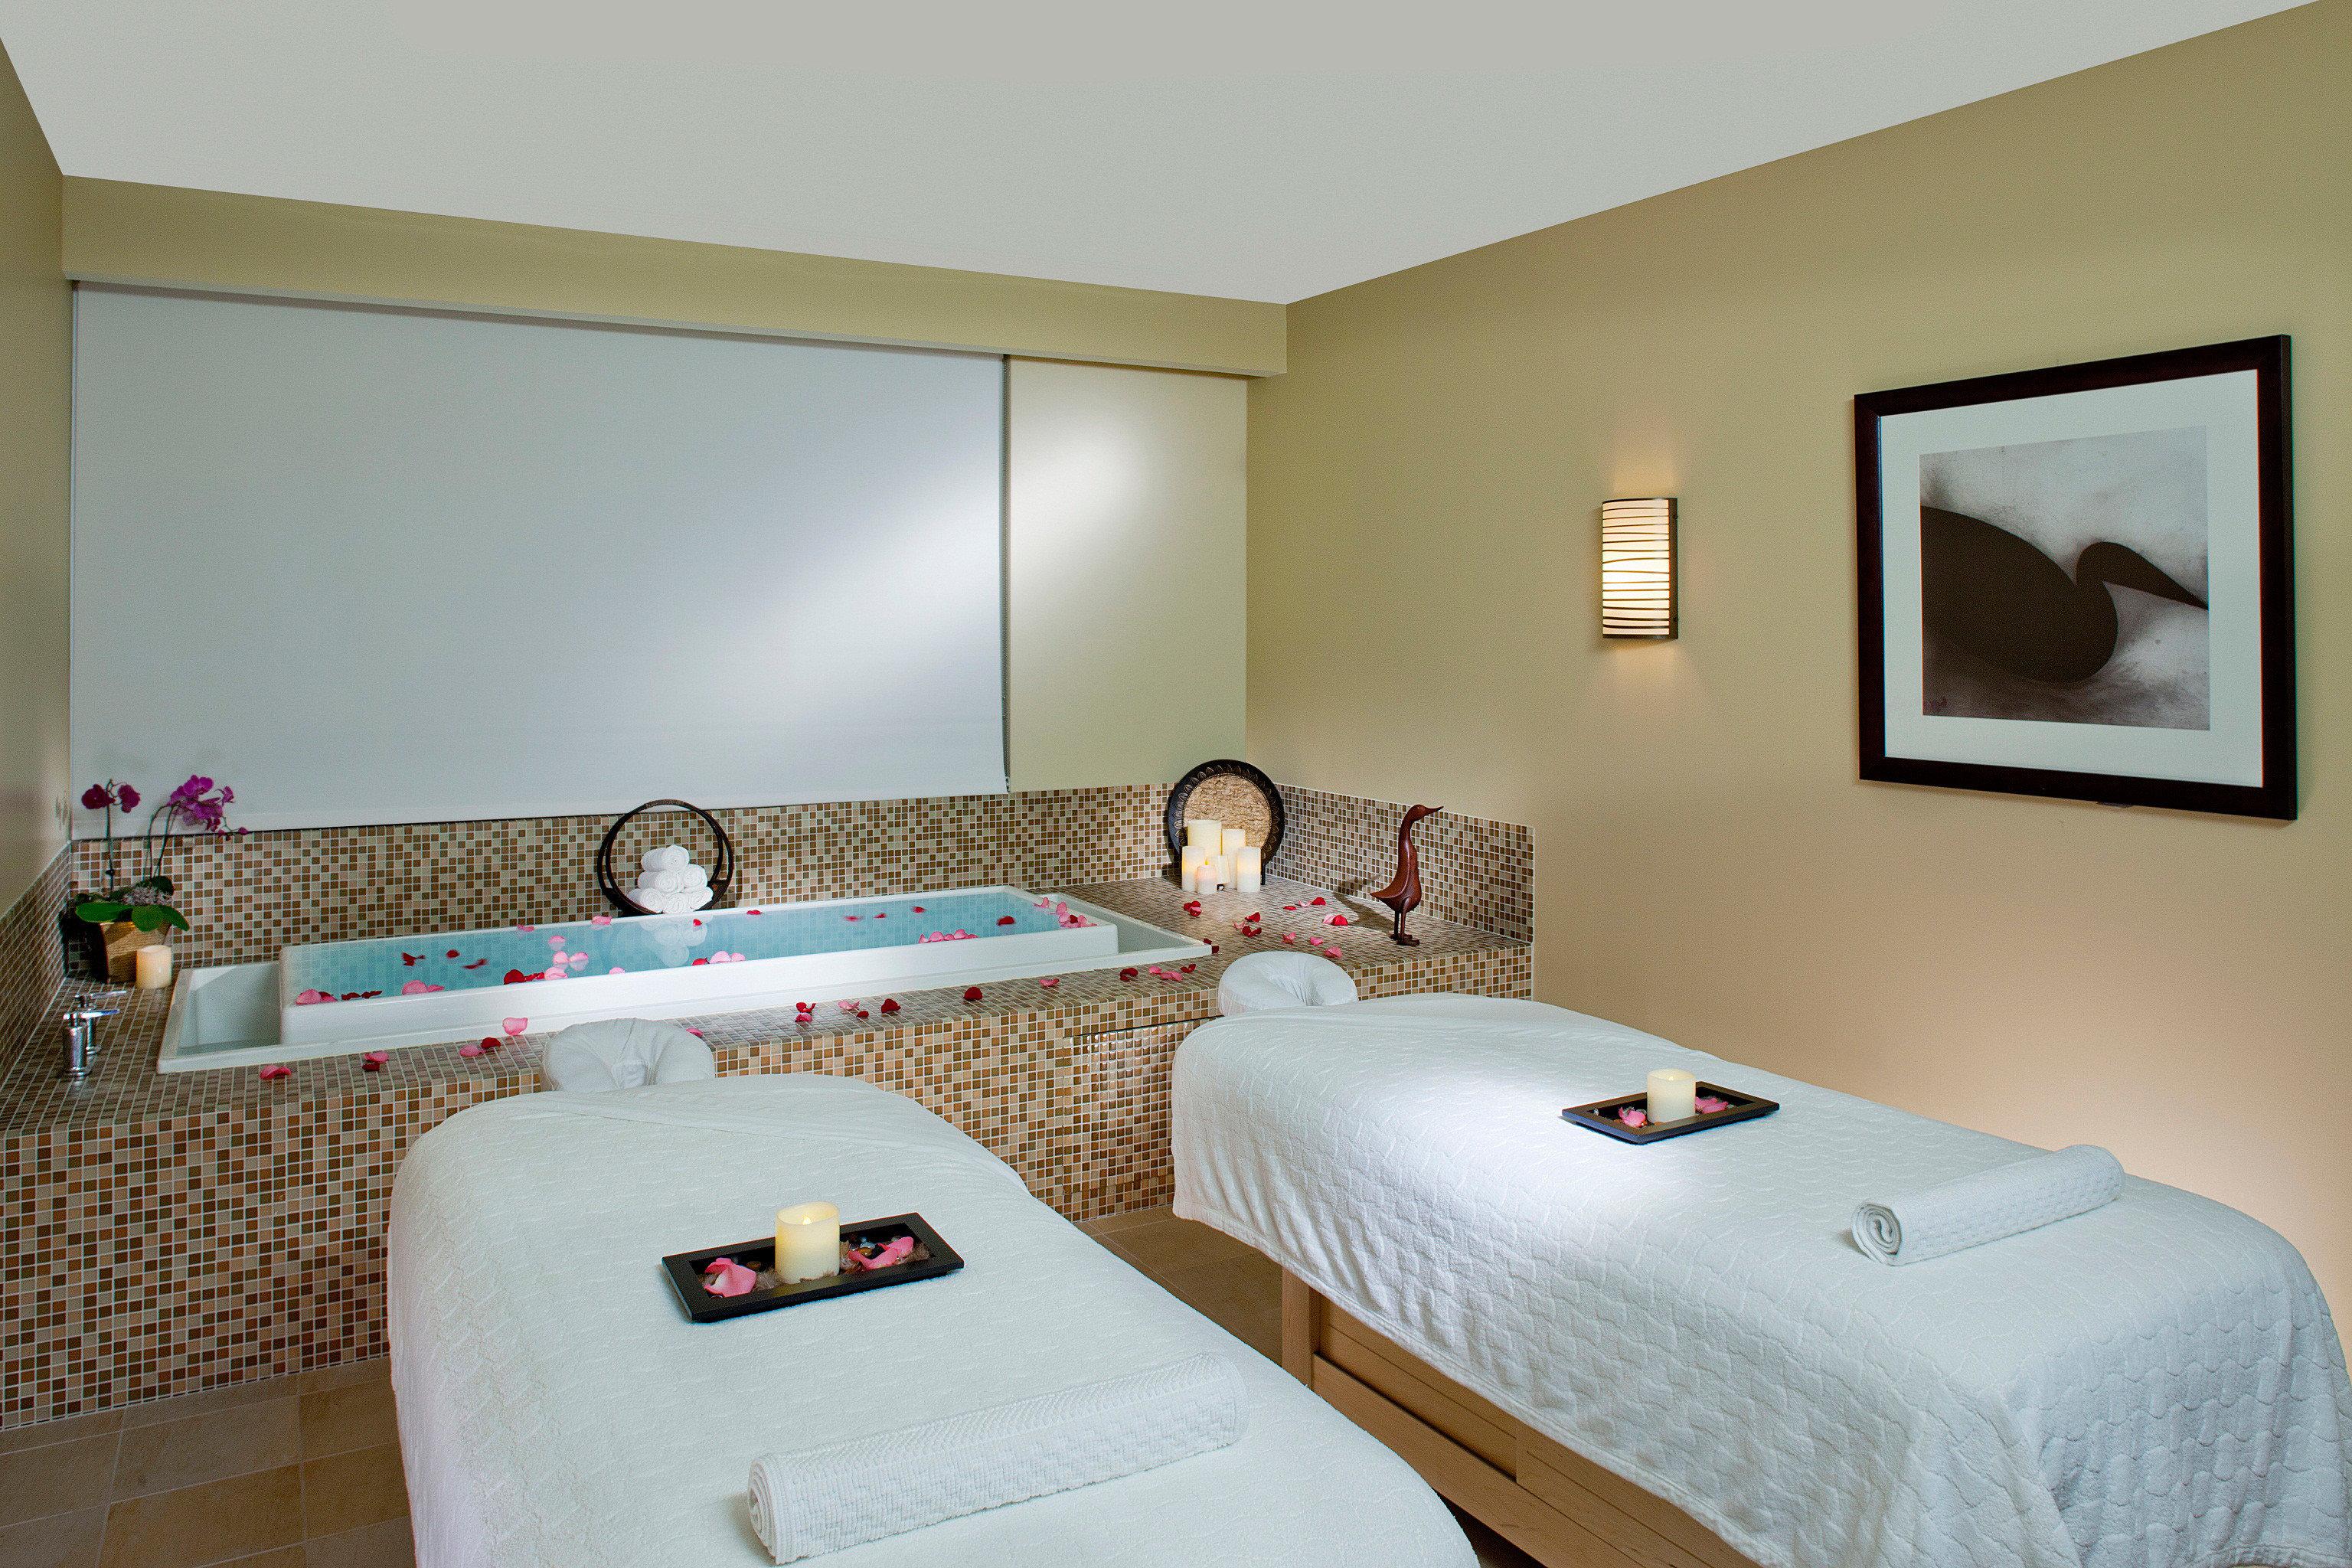 Bar Luxury Romantic Spa property Bedroom Suite cottage